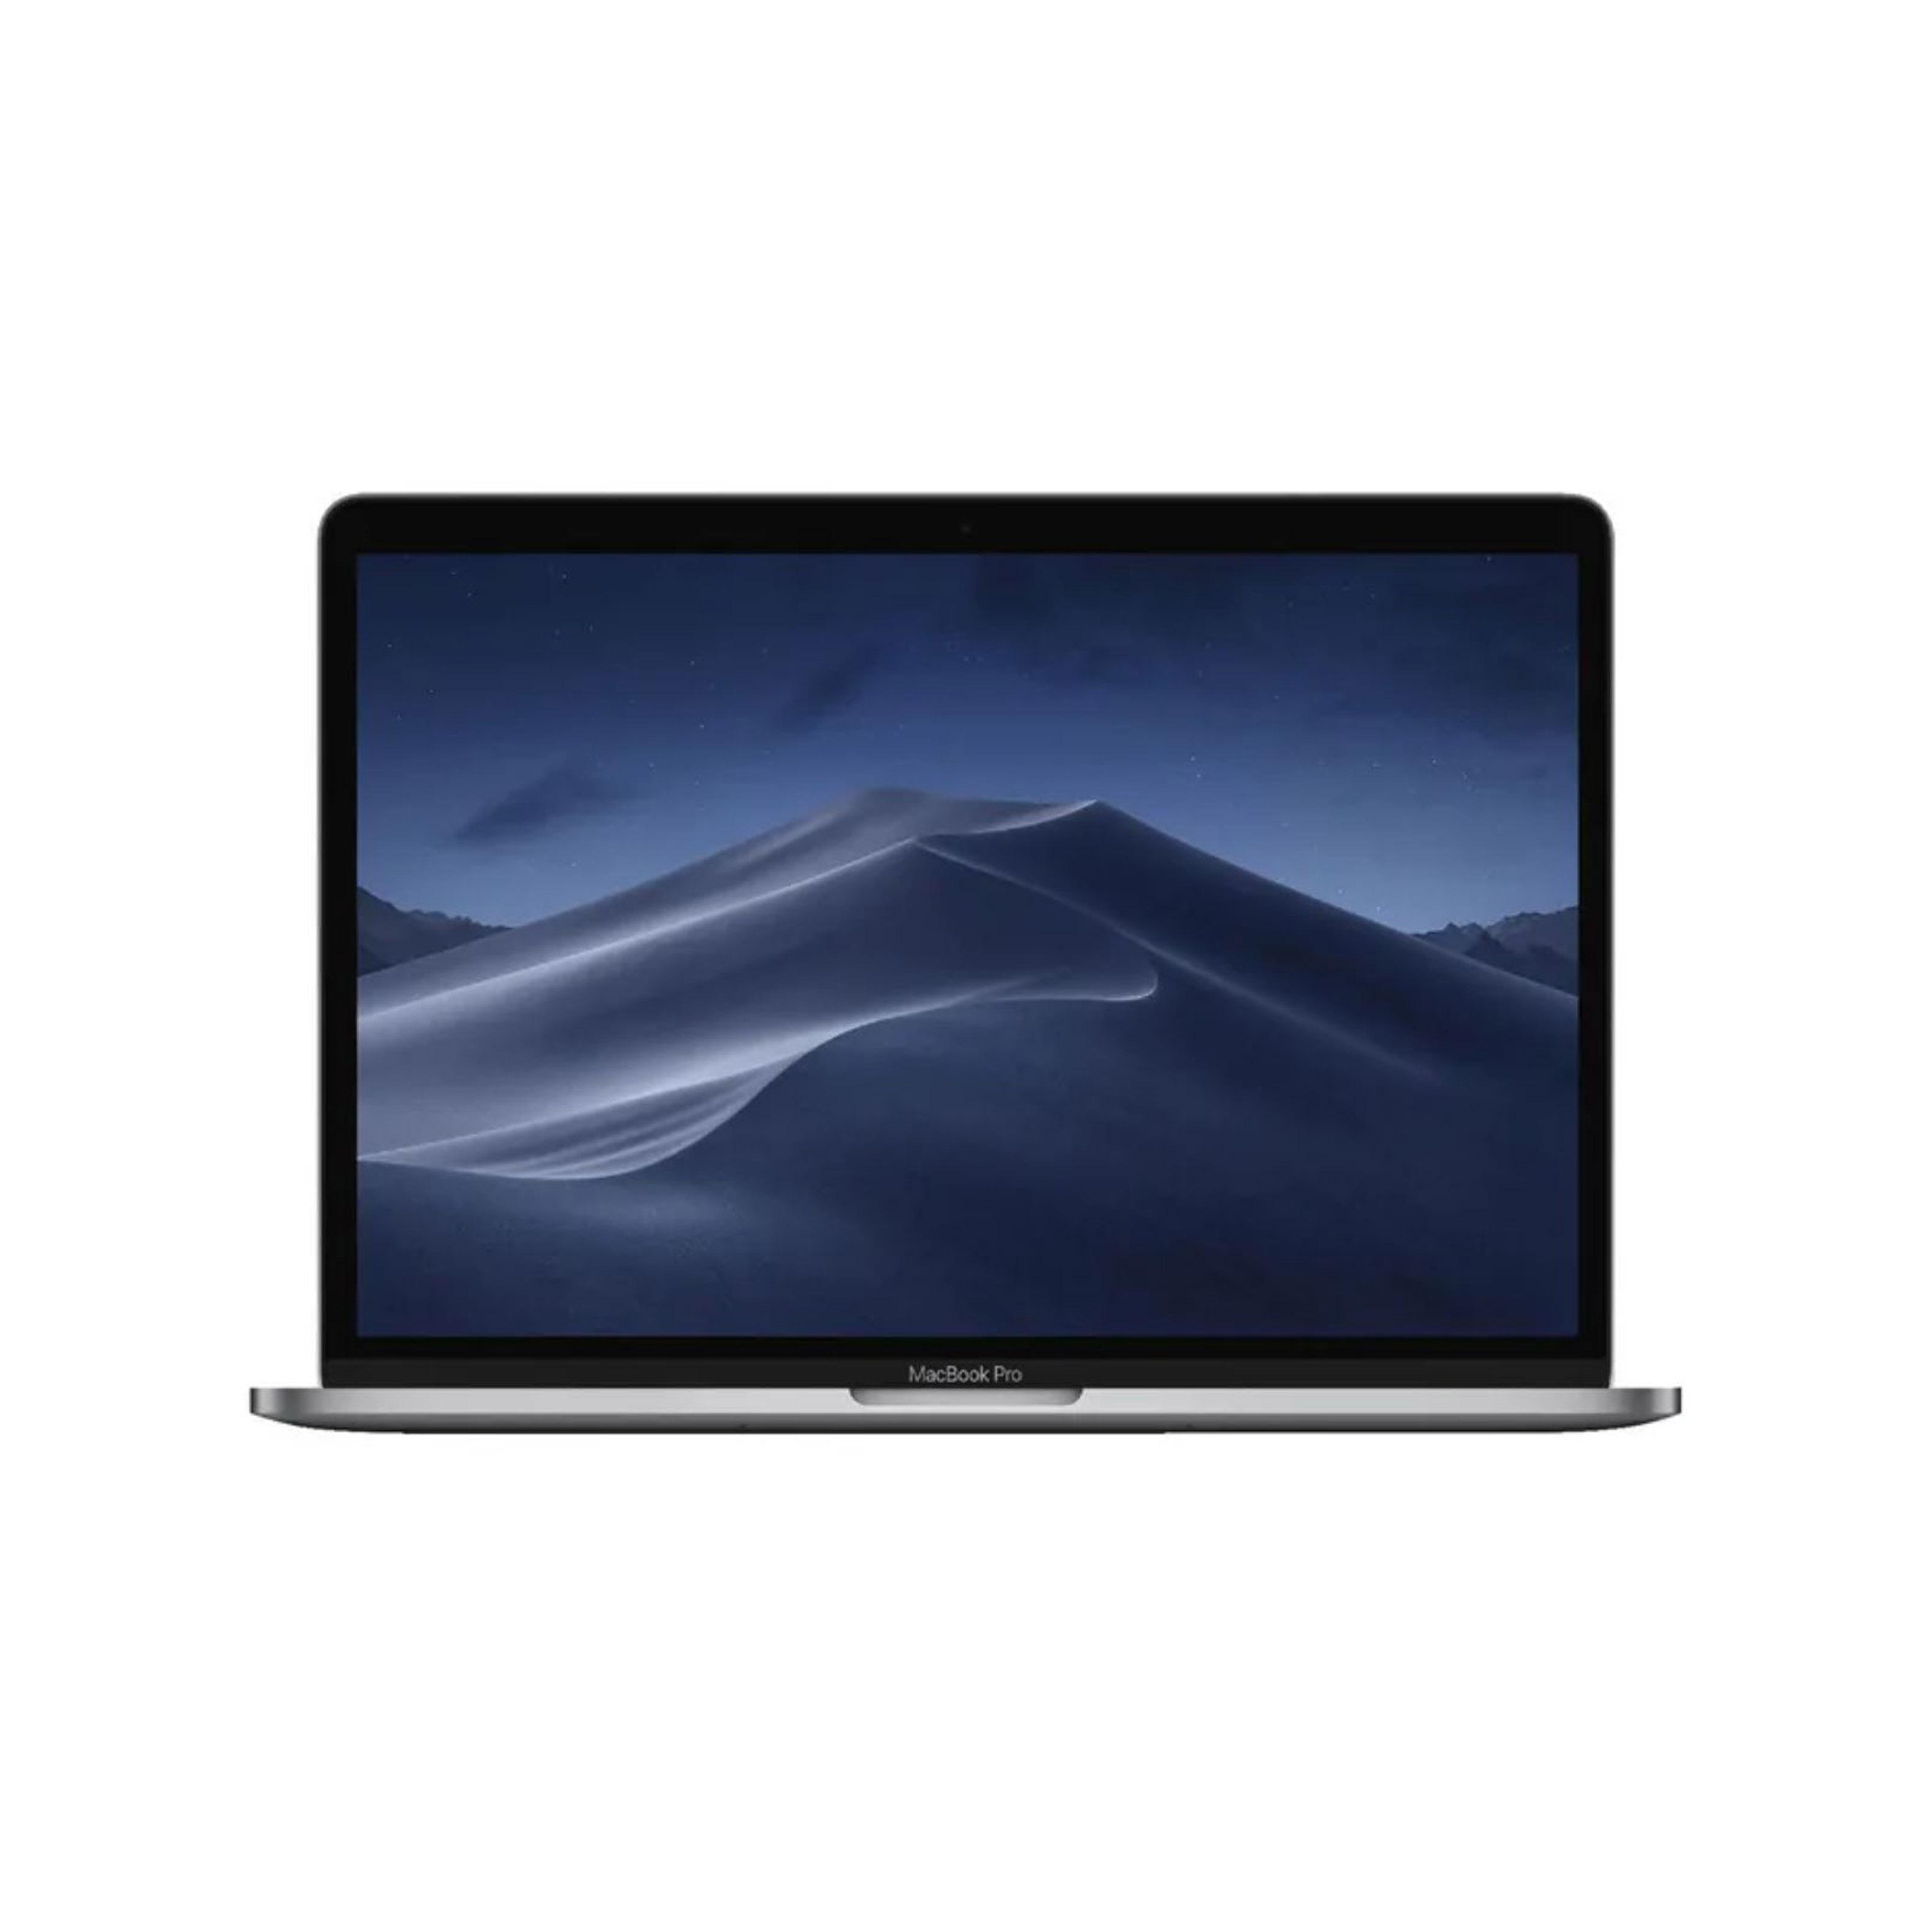 Apple 13in MacBook Pro 2020 - 1.4GHz 8th Gen Intel i5 512GB - Space Grey (MXK52X/A)